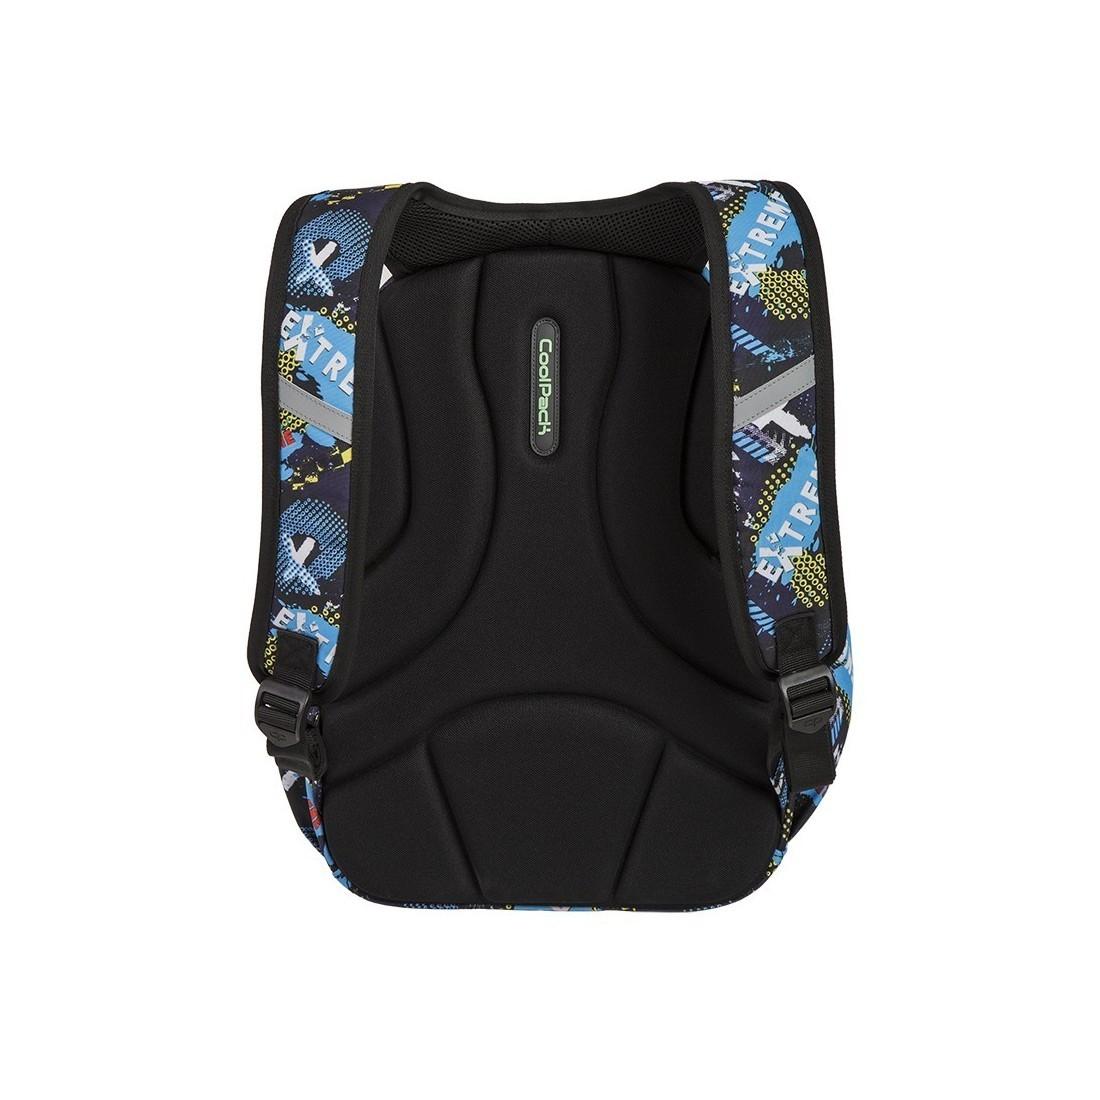 8fabe2861b7c5 ... Plecak do szkoły (klasy 1-3) CoolPack CP PRIME EXTREME profilowane  plecy ...